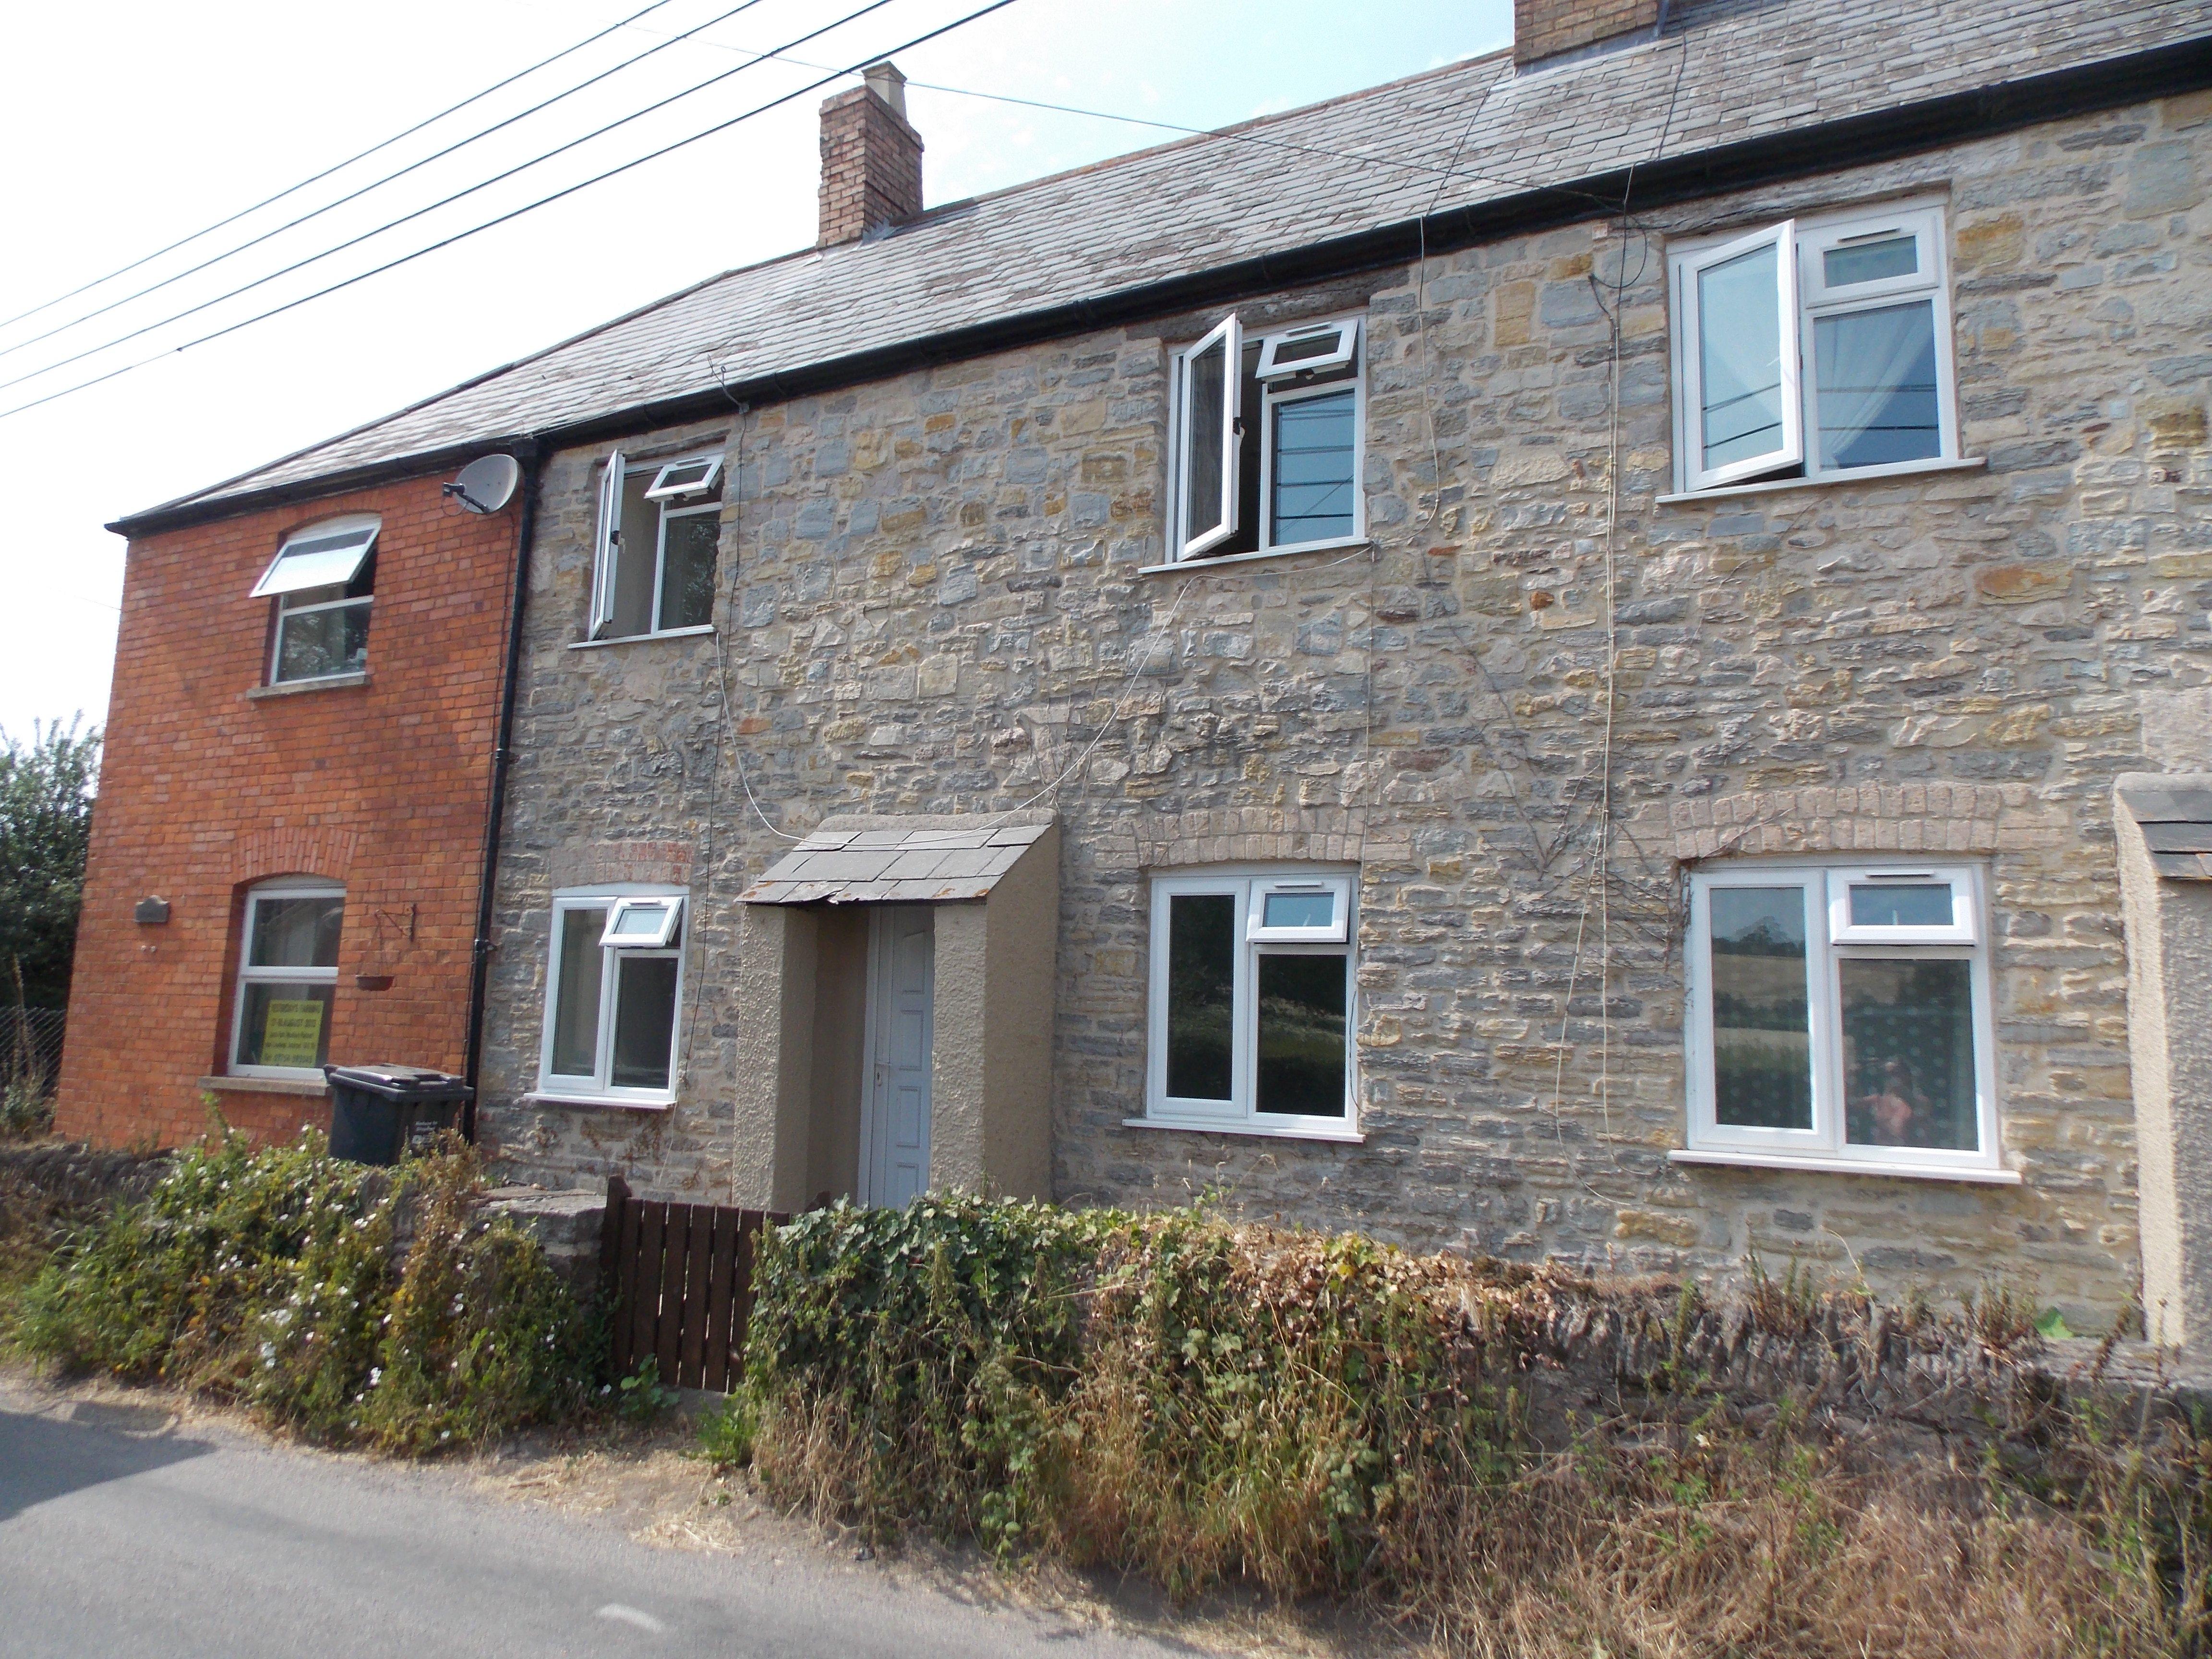 Arundel Cottages , Lower Henlade, Taunton